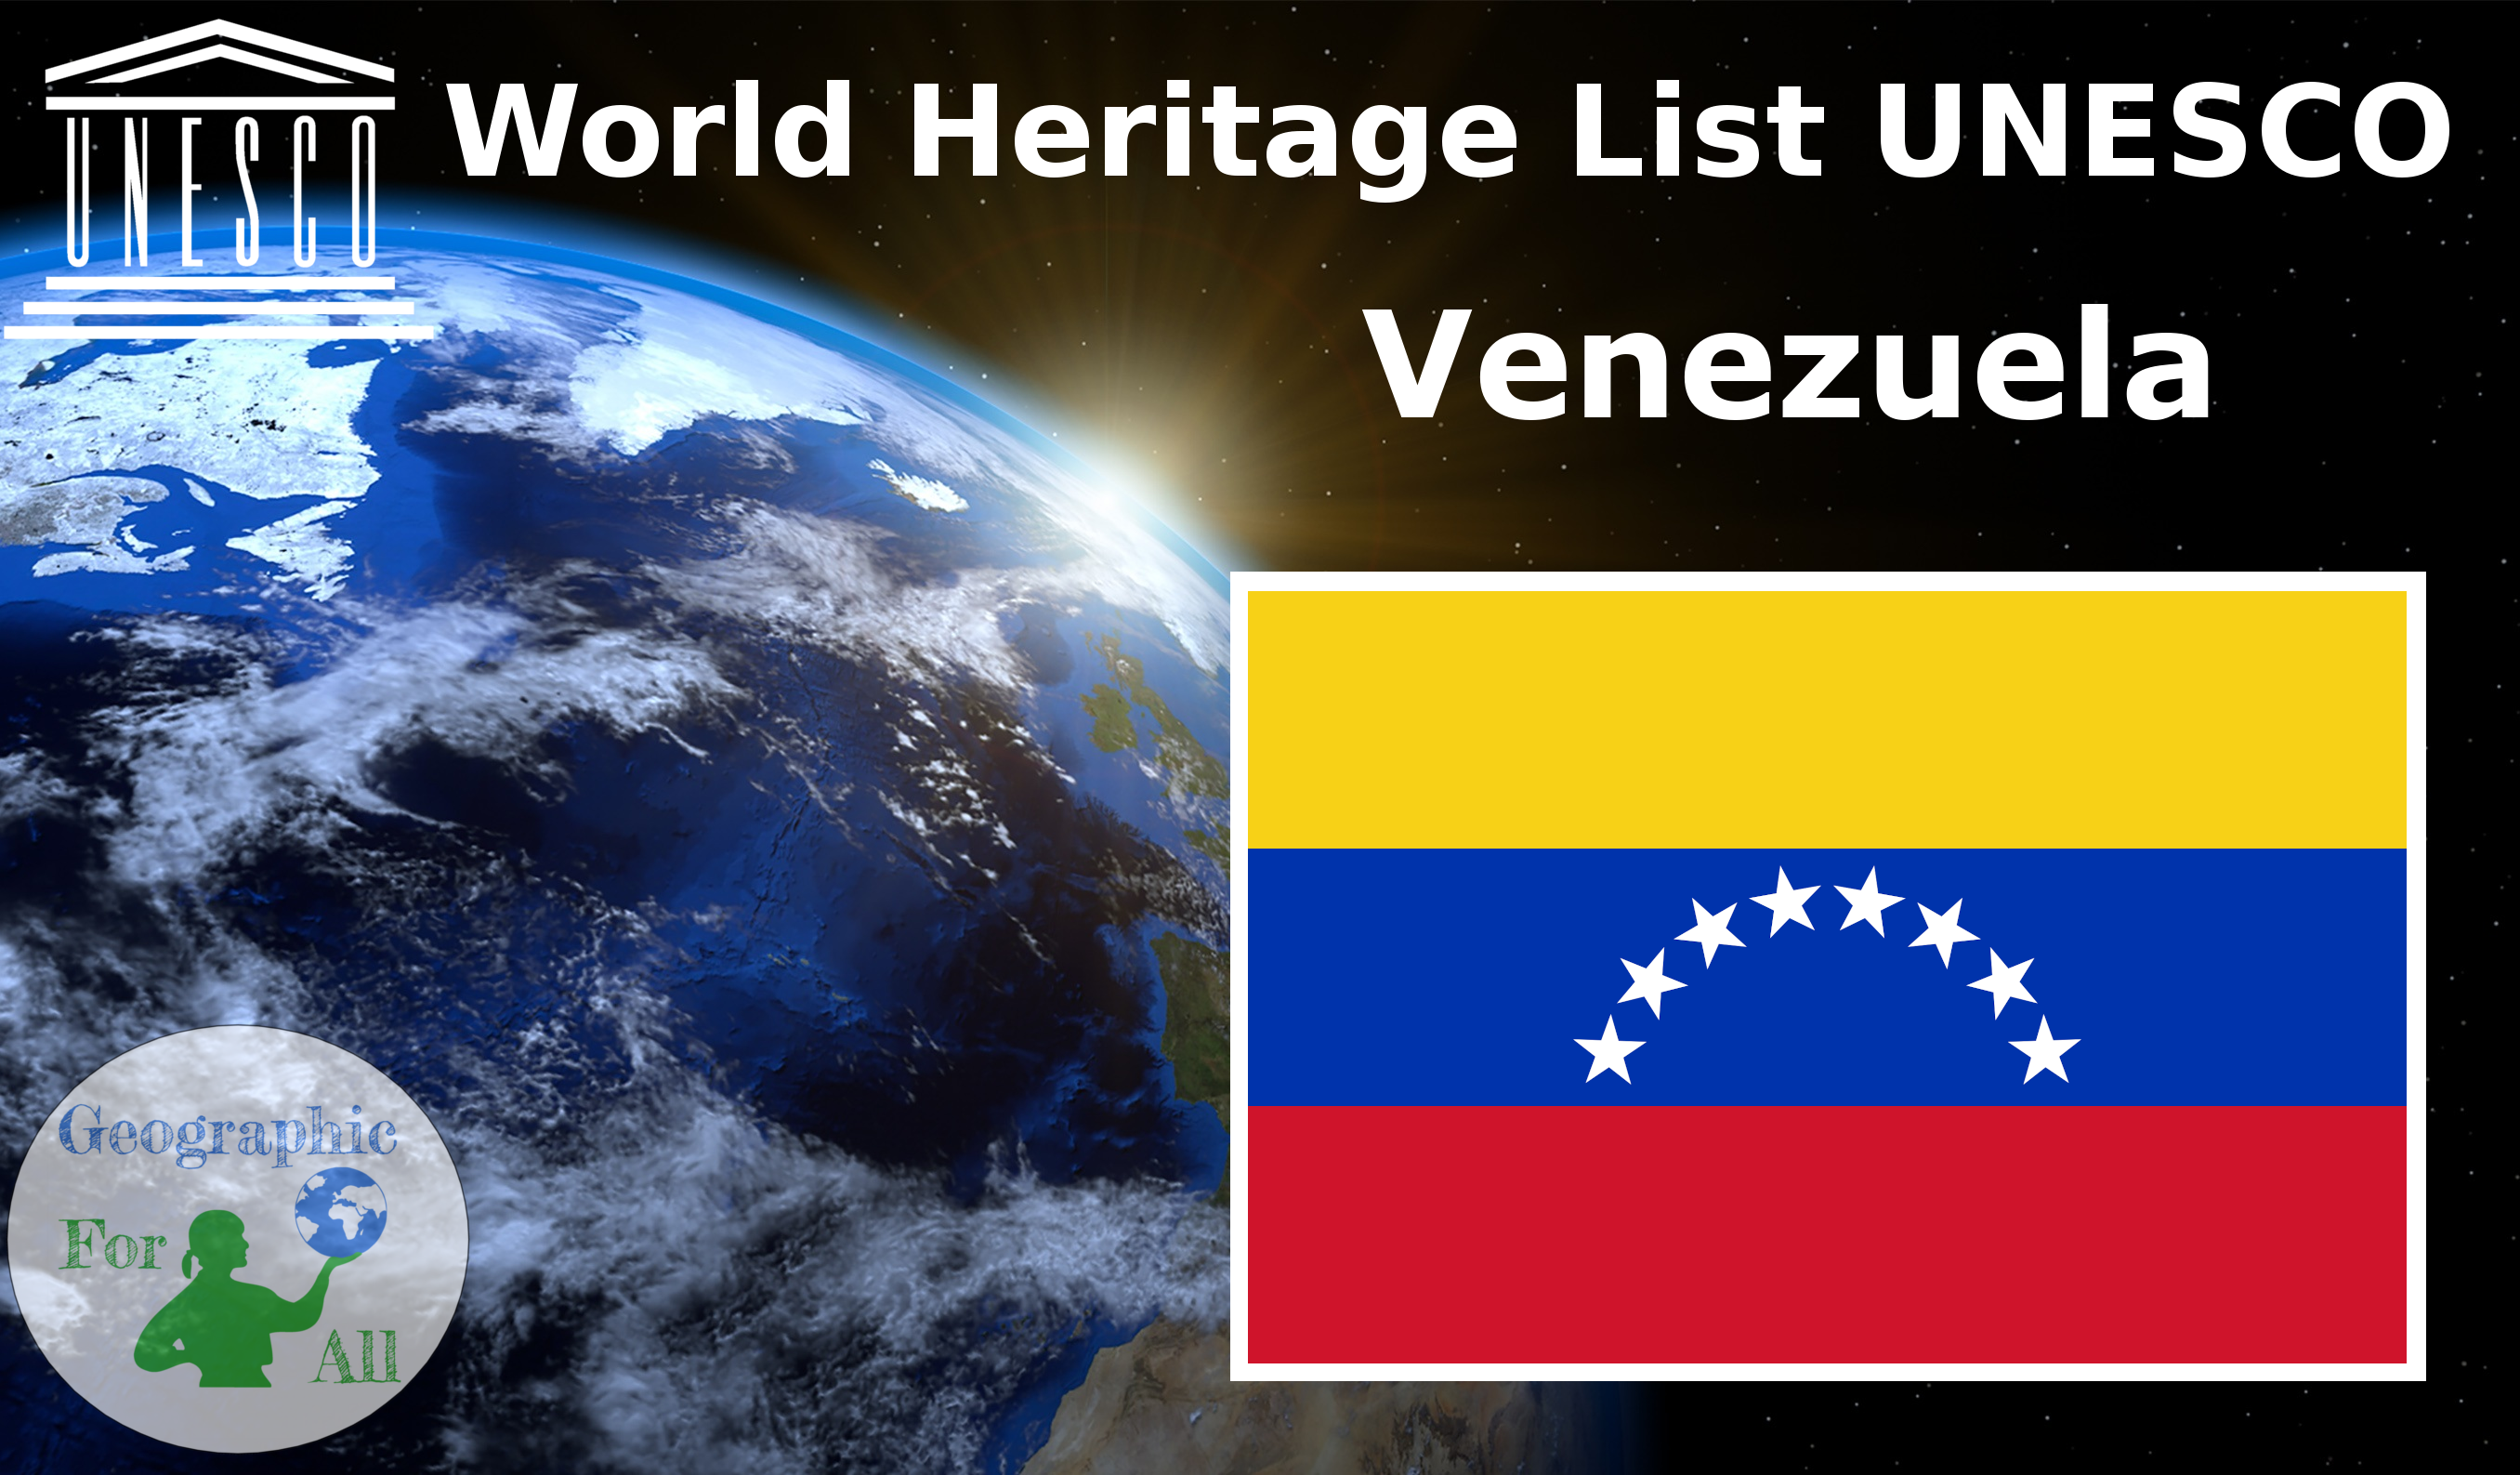 World Heritage List UNESCO - Venezuela